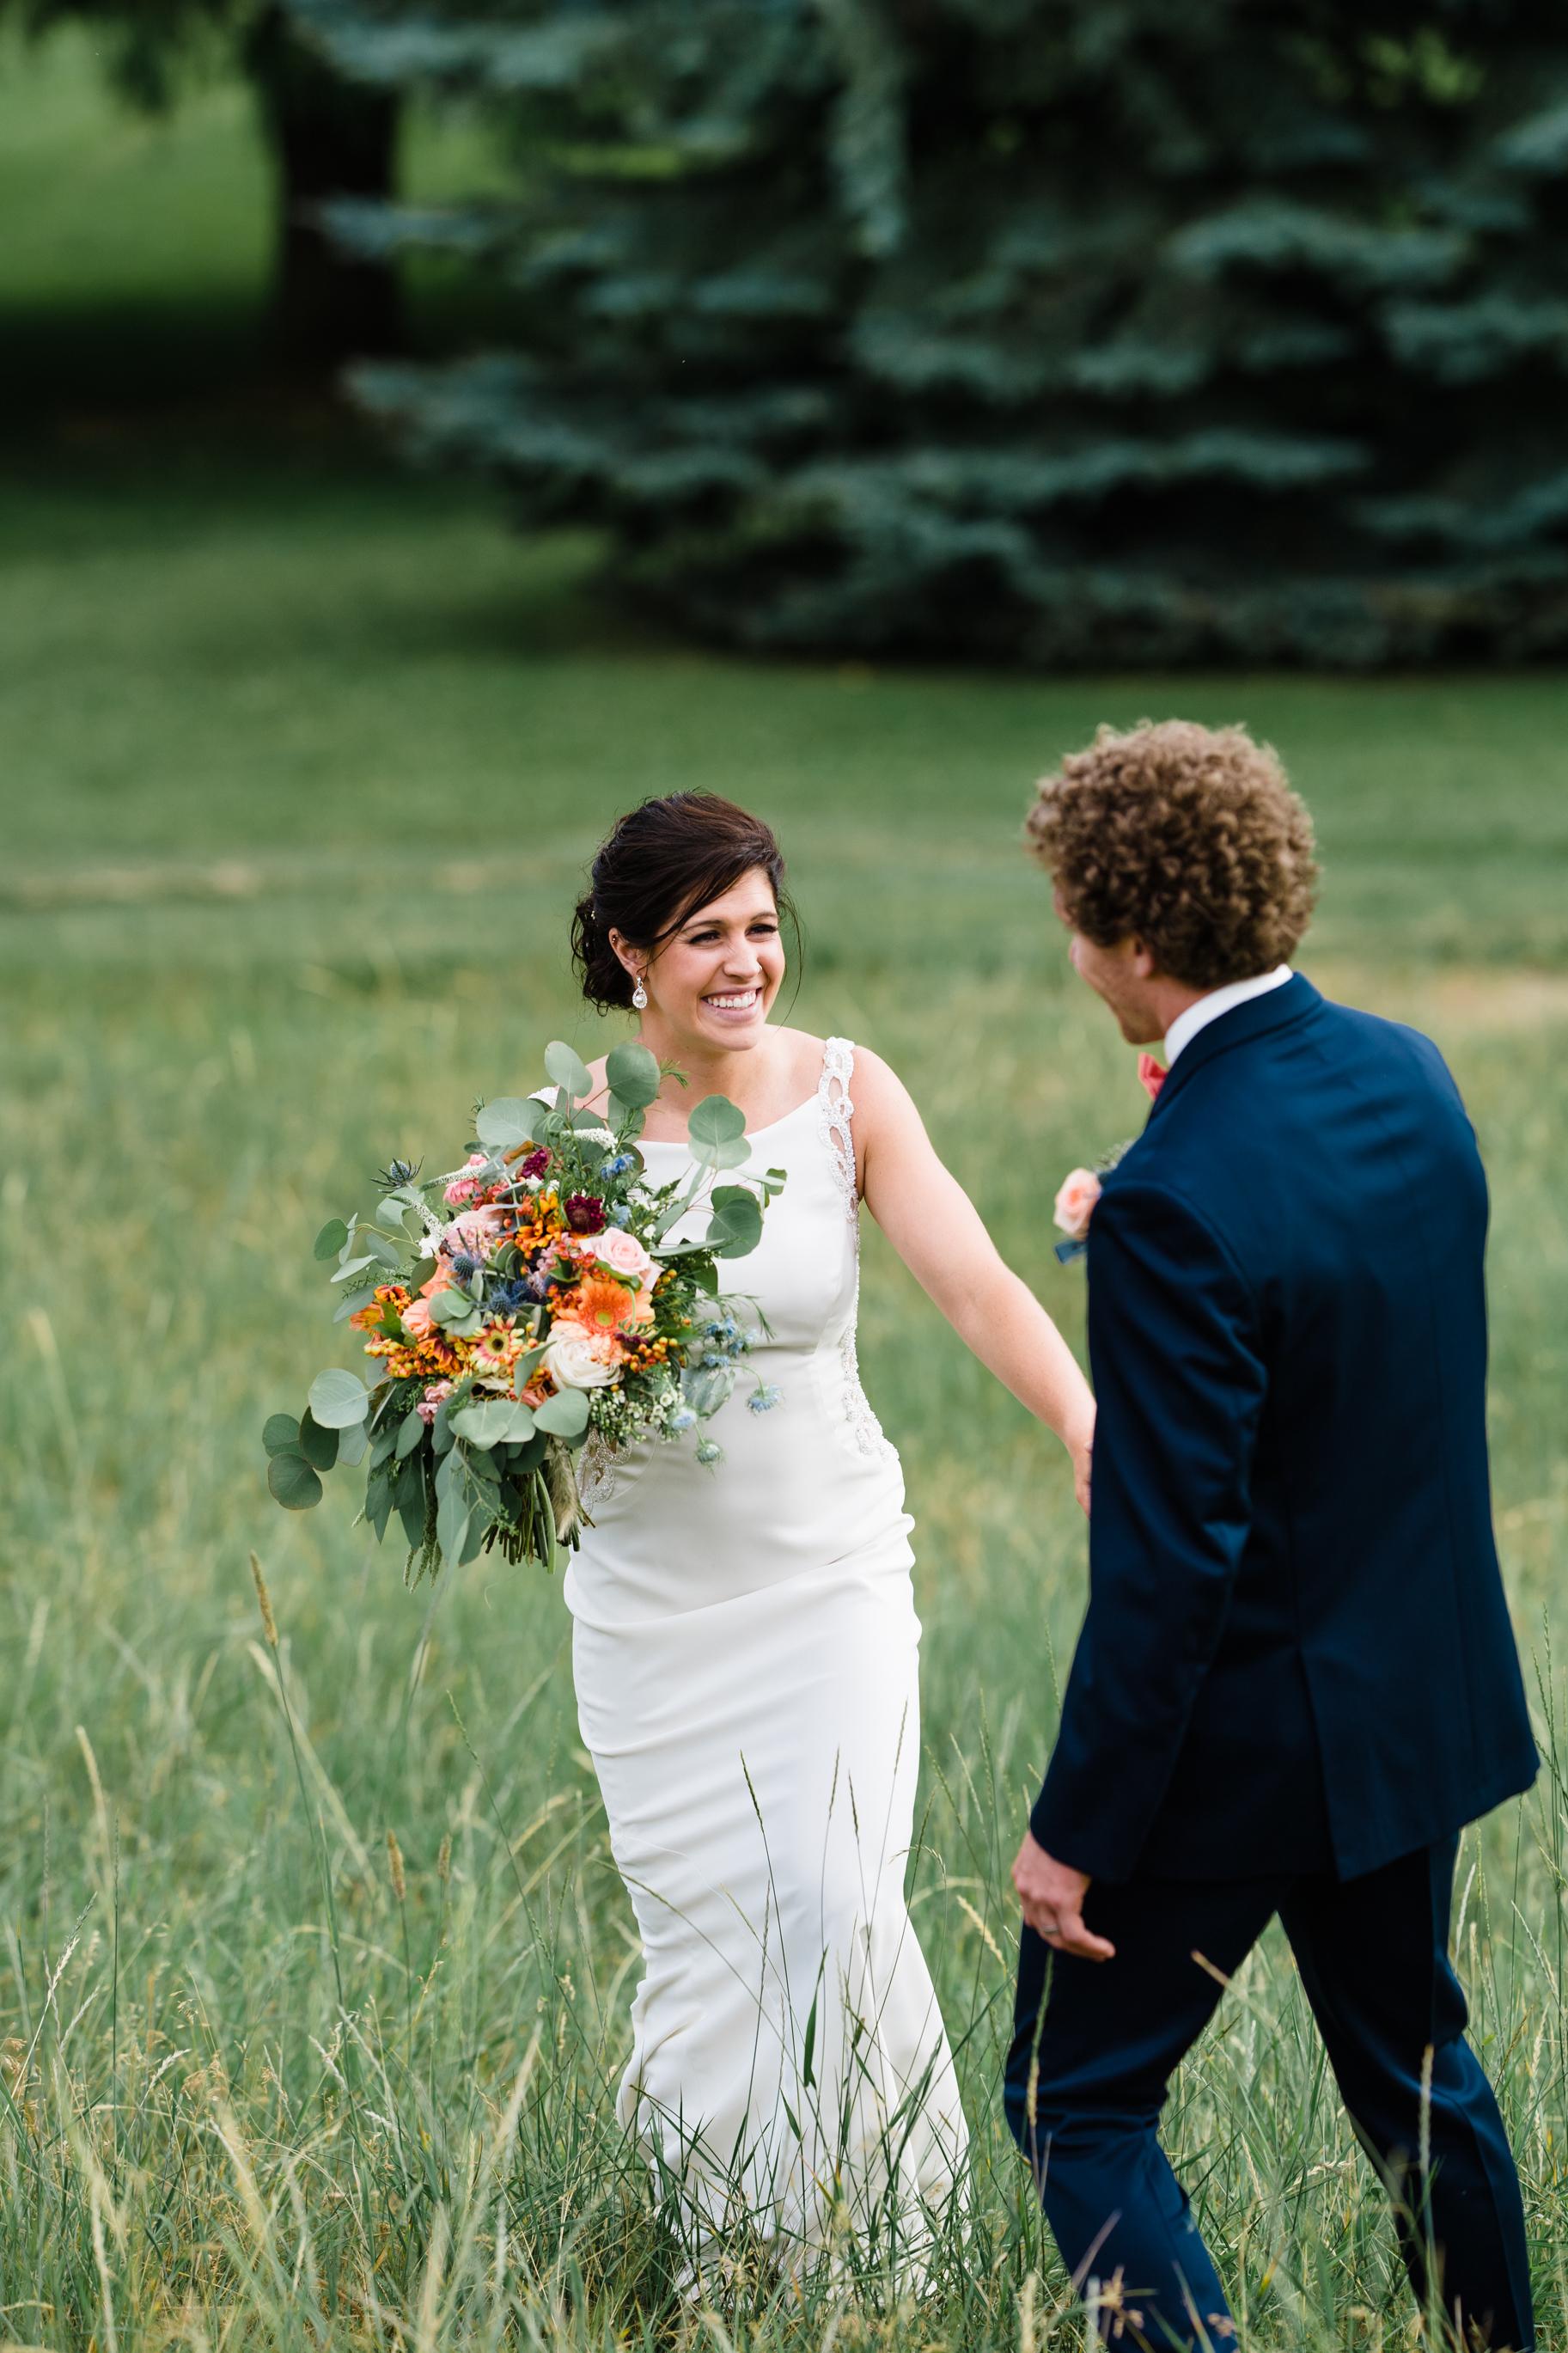 025The Barn at Finley Point Wedding_Montana Wedding Photographer_Katy & Bryce_July 20, 2019-508.jpg